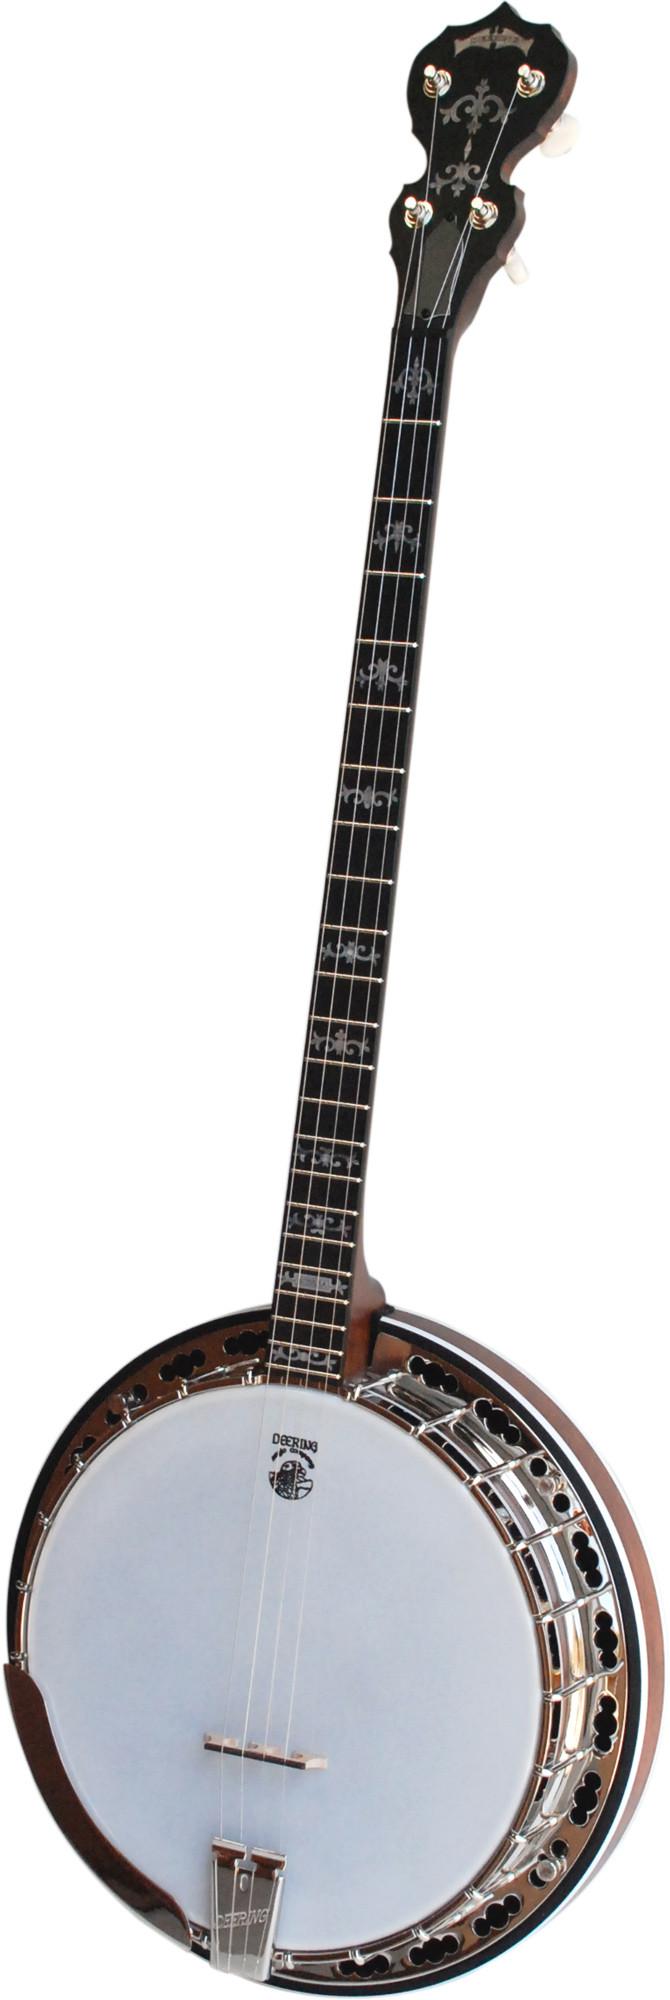 Deering Sierra™ Plectrum Banjo